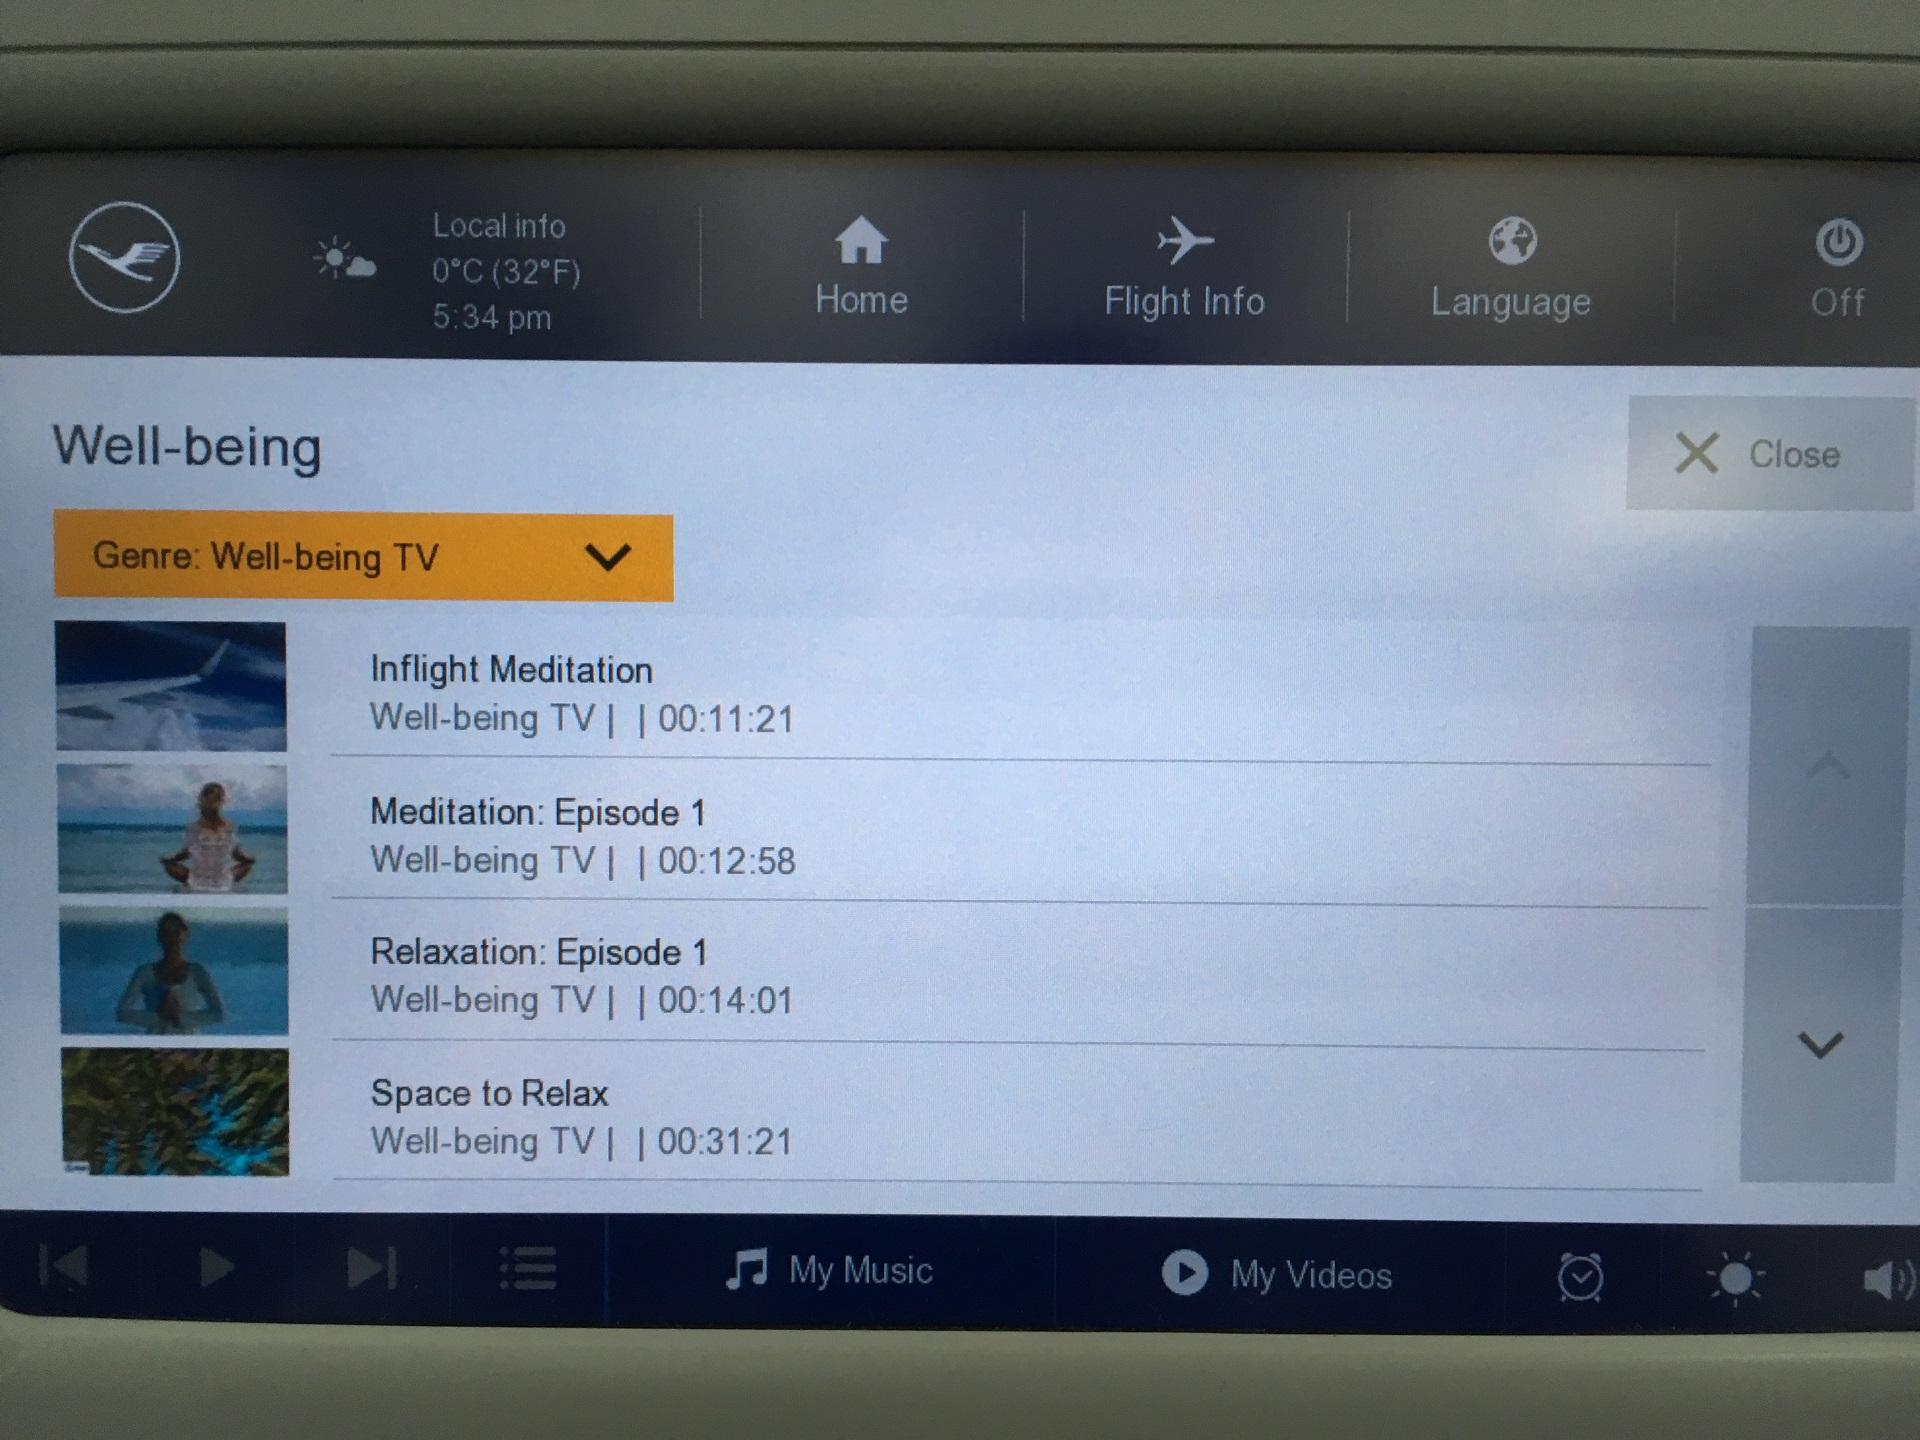 Lufthansa_fedelzeti_internet_inflight_WiFi